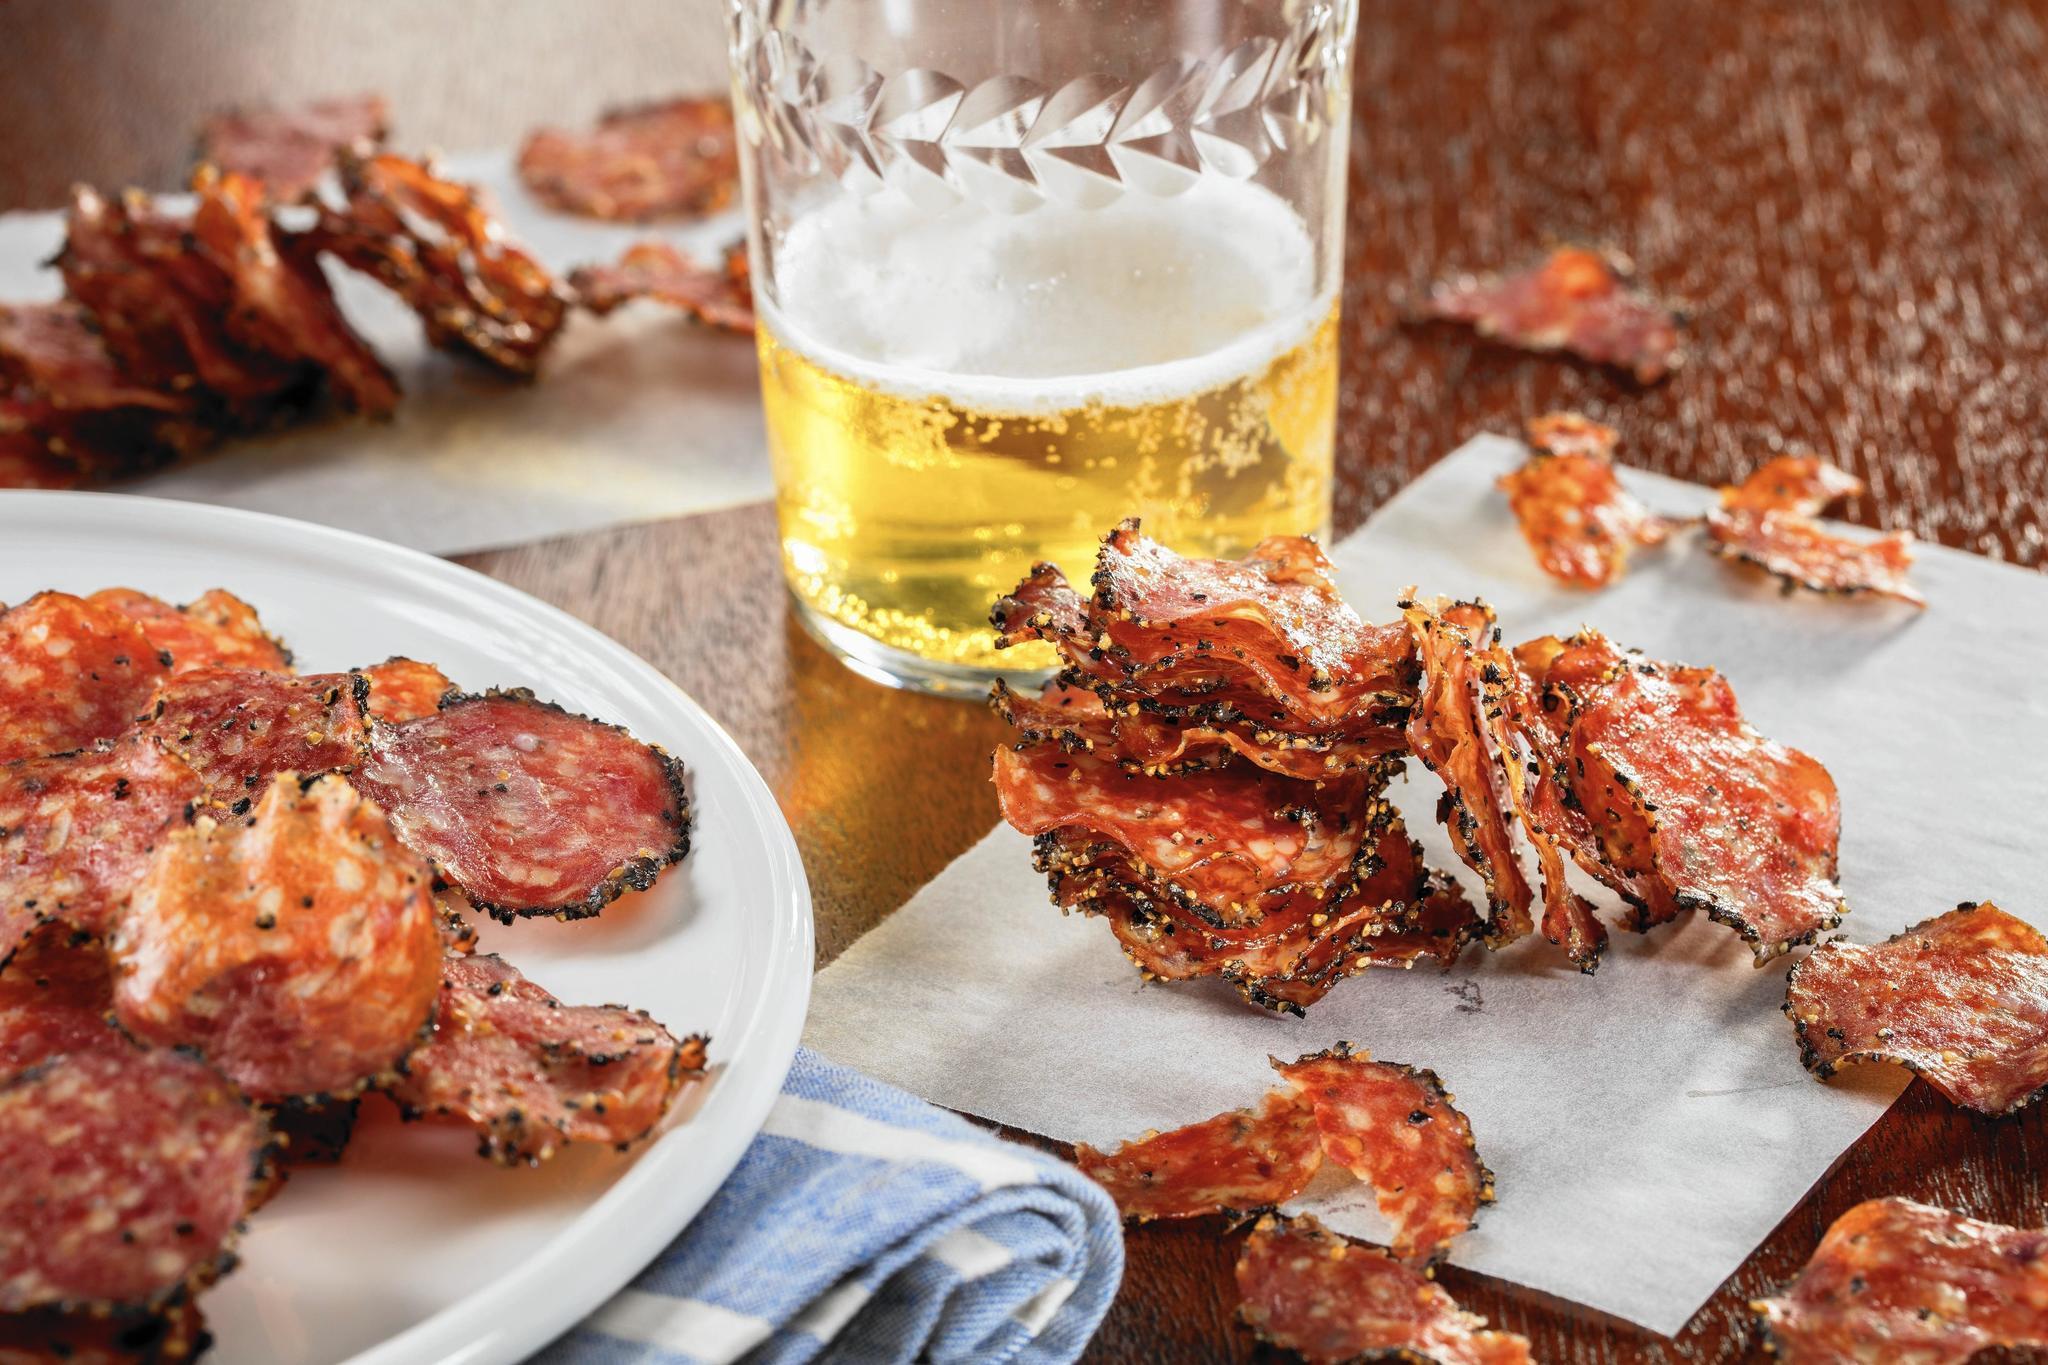 Sausage lover's menu, from breakfast to dinner to salami crisp snack